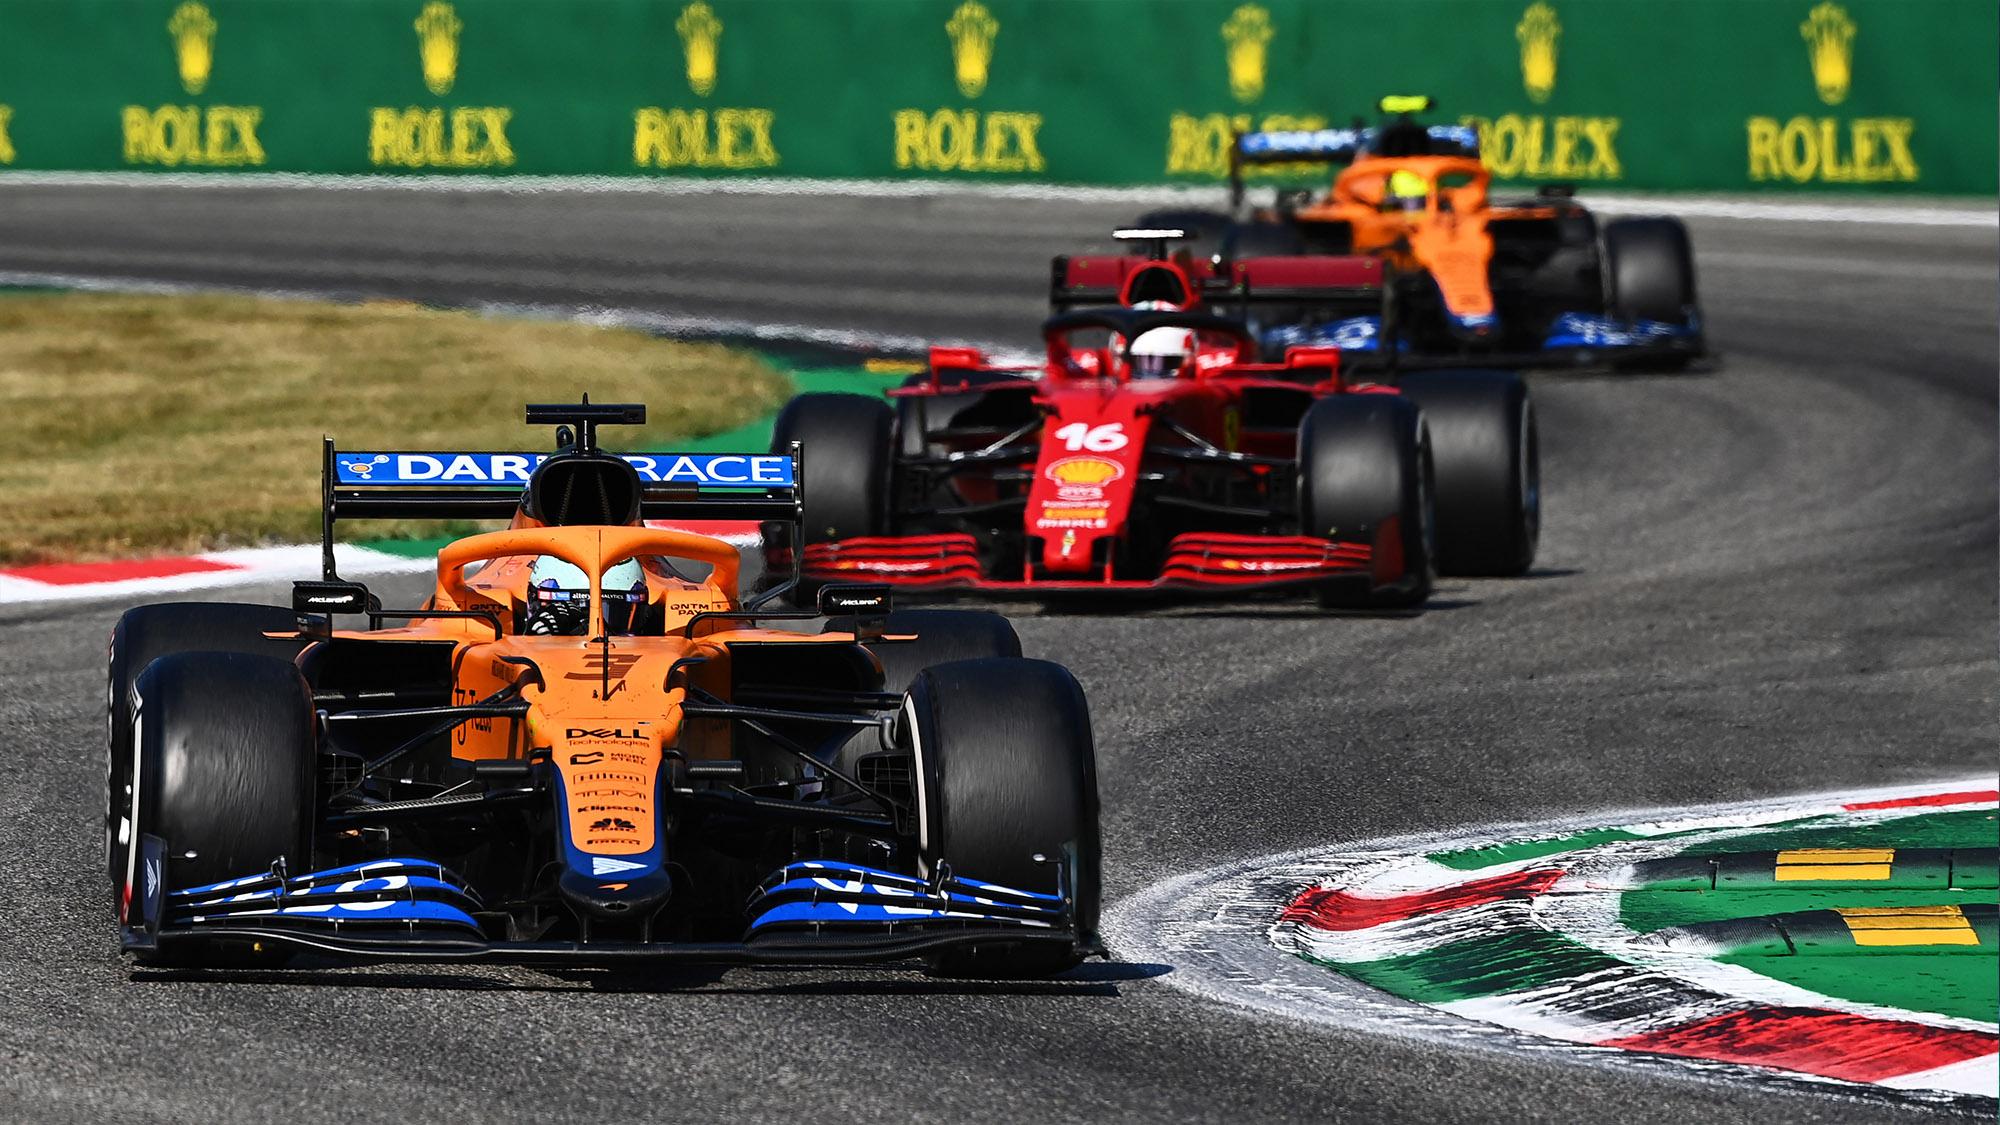 Charles Leclerc between mcLarens in the 2021 italian Grand Prix